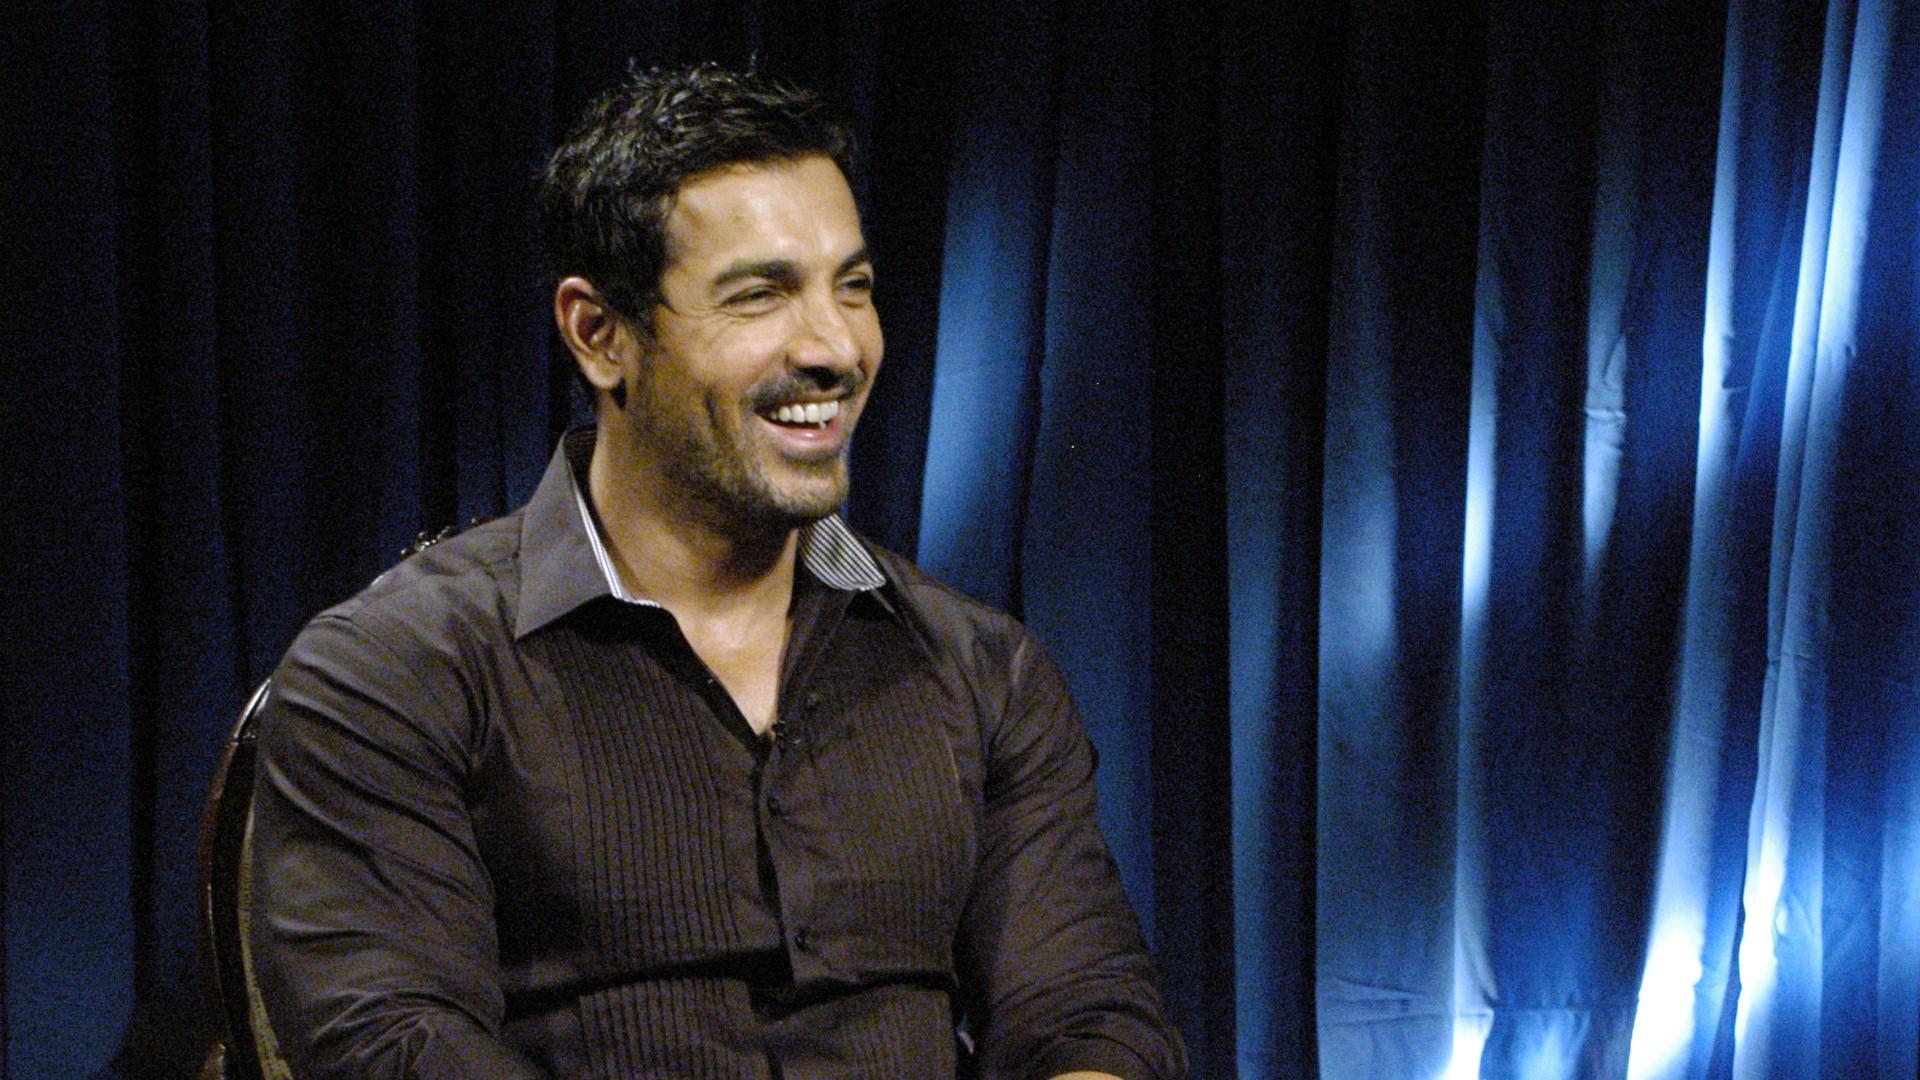 RAW, John Abraham, Romeo Akbar Walter, Sikander Kher, Moni Roy, Movie, Release Date, News Mobile, News Mobile India